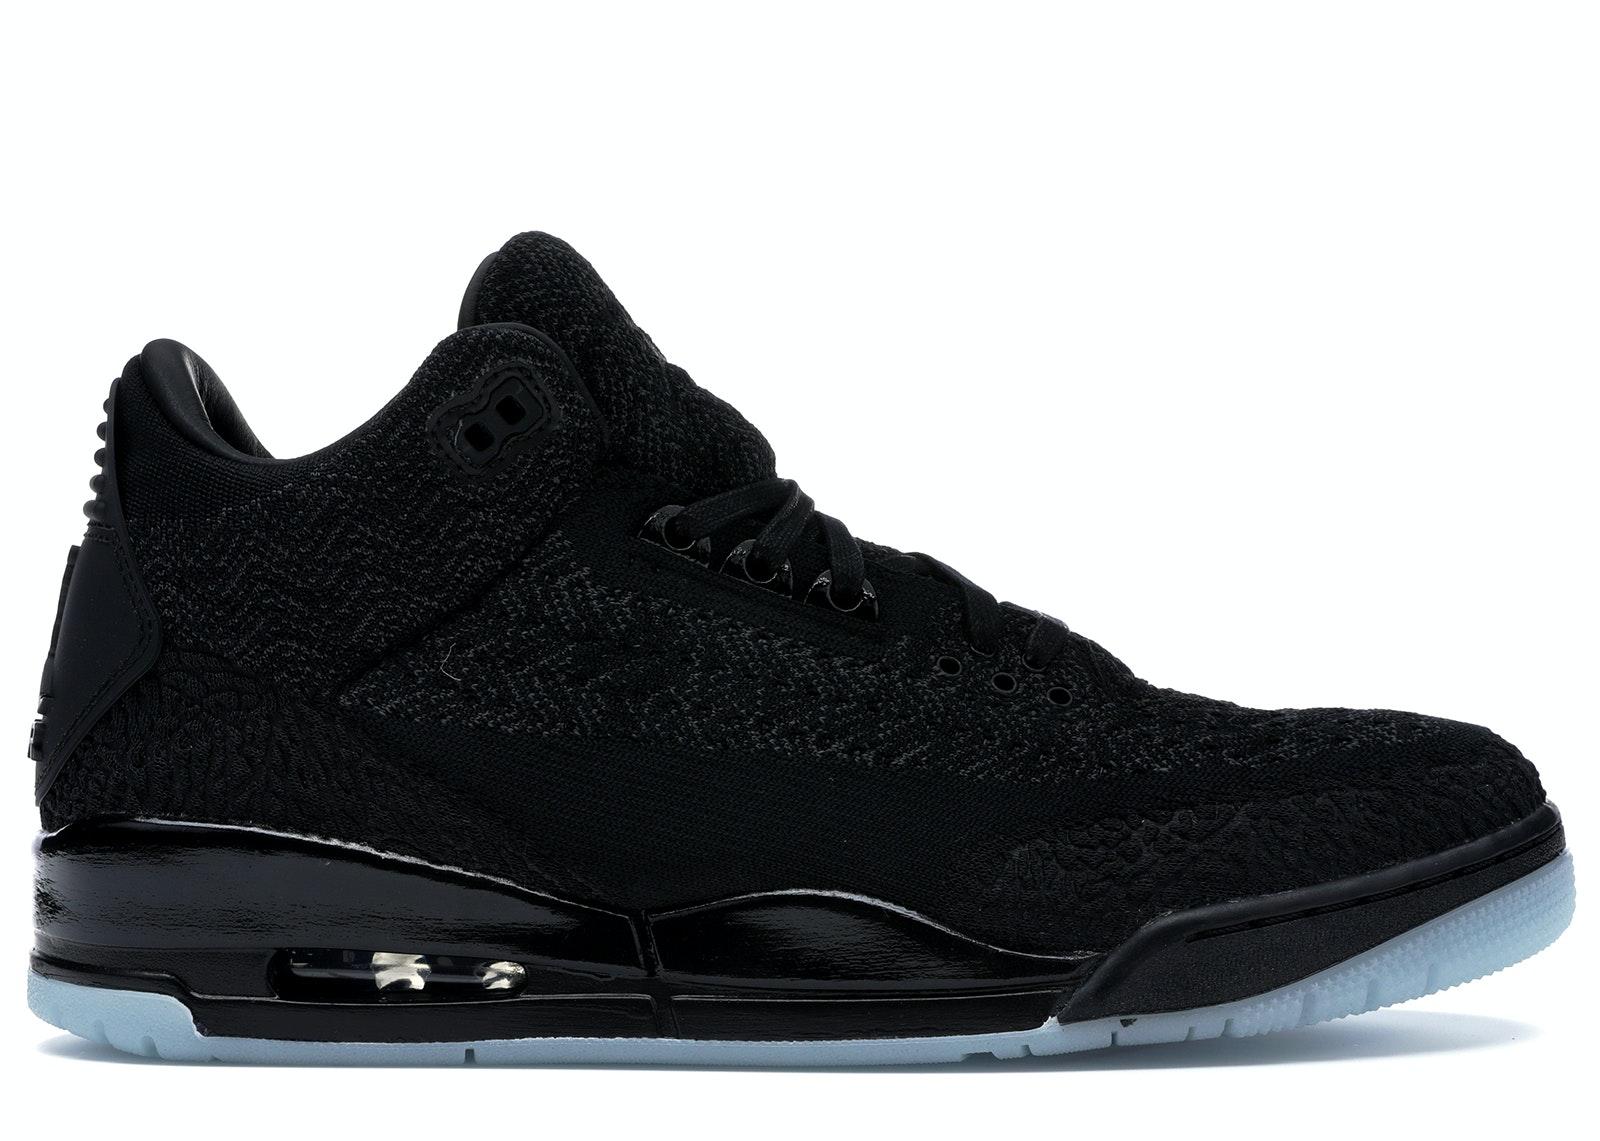 jordan 3 all black